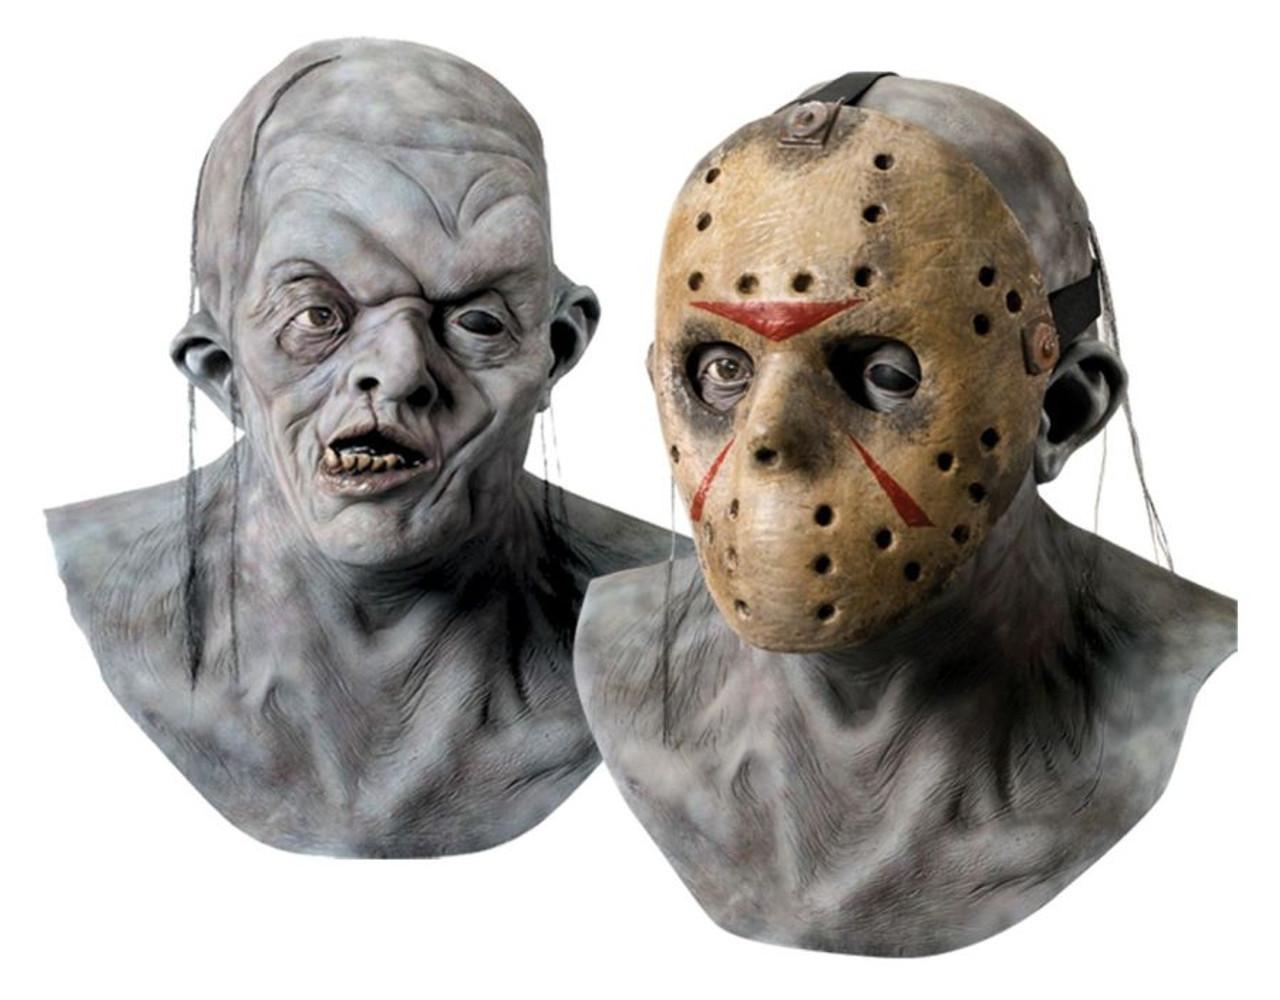 Friday the 13th Jason Voorhees Hockey Mask Foam Halloween Costume Accessory